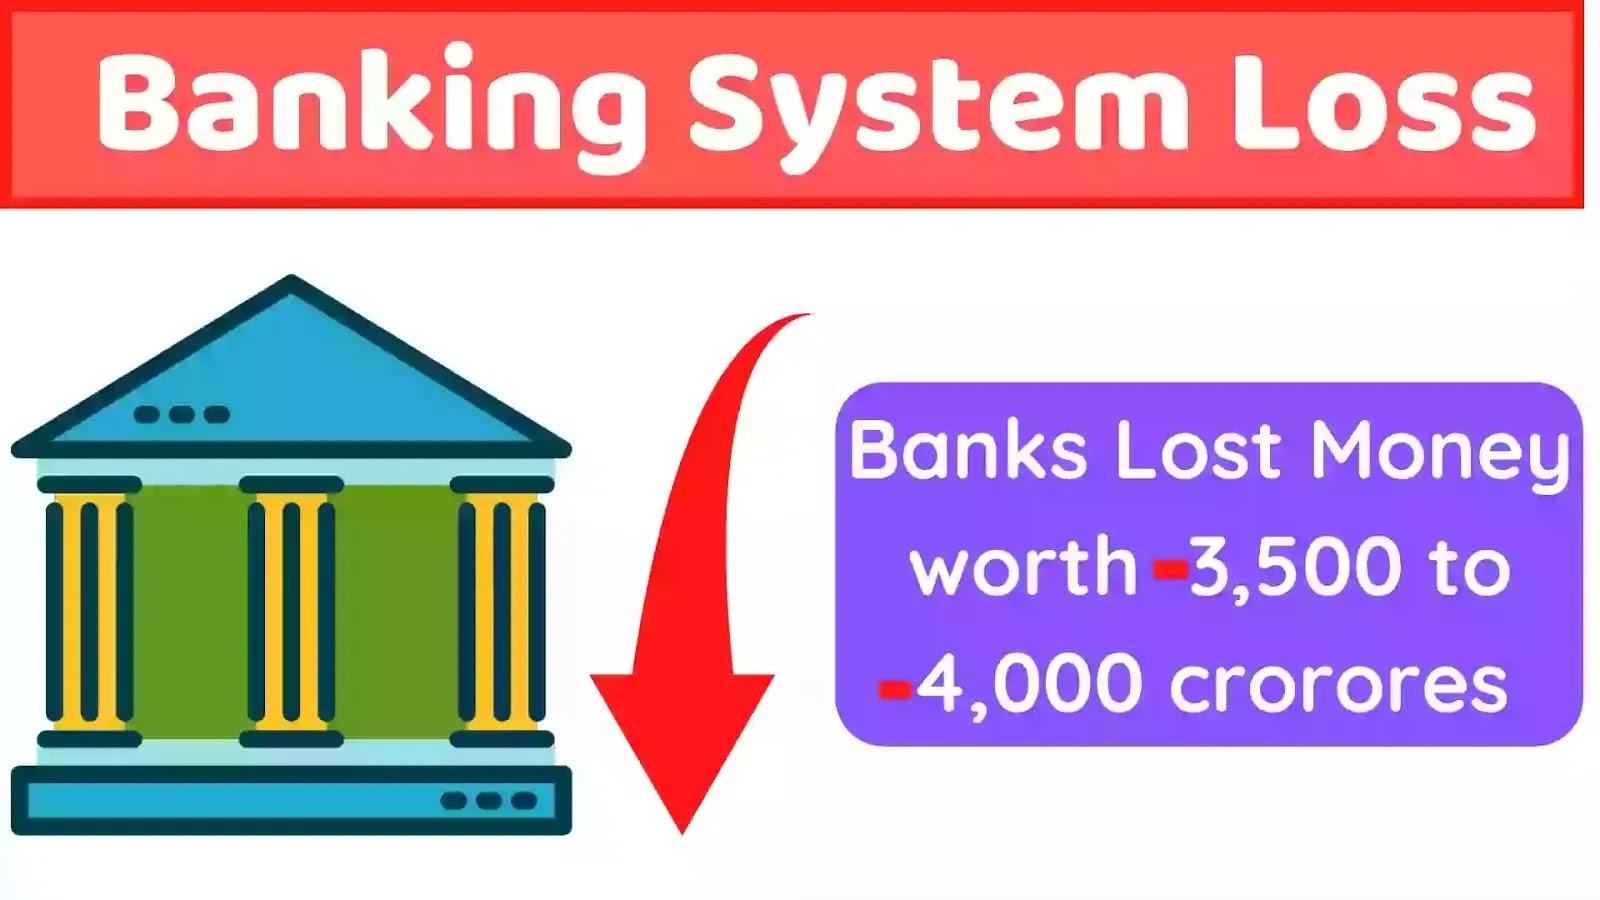 Banking System Loss